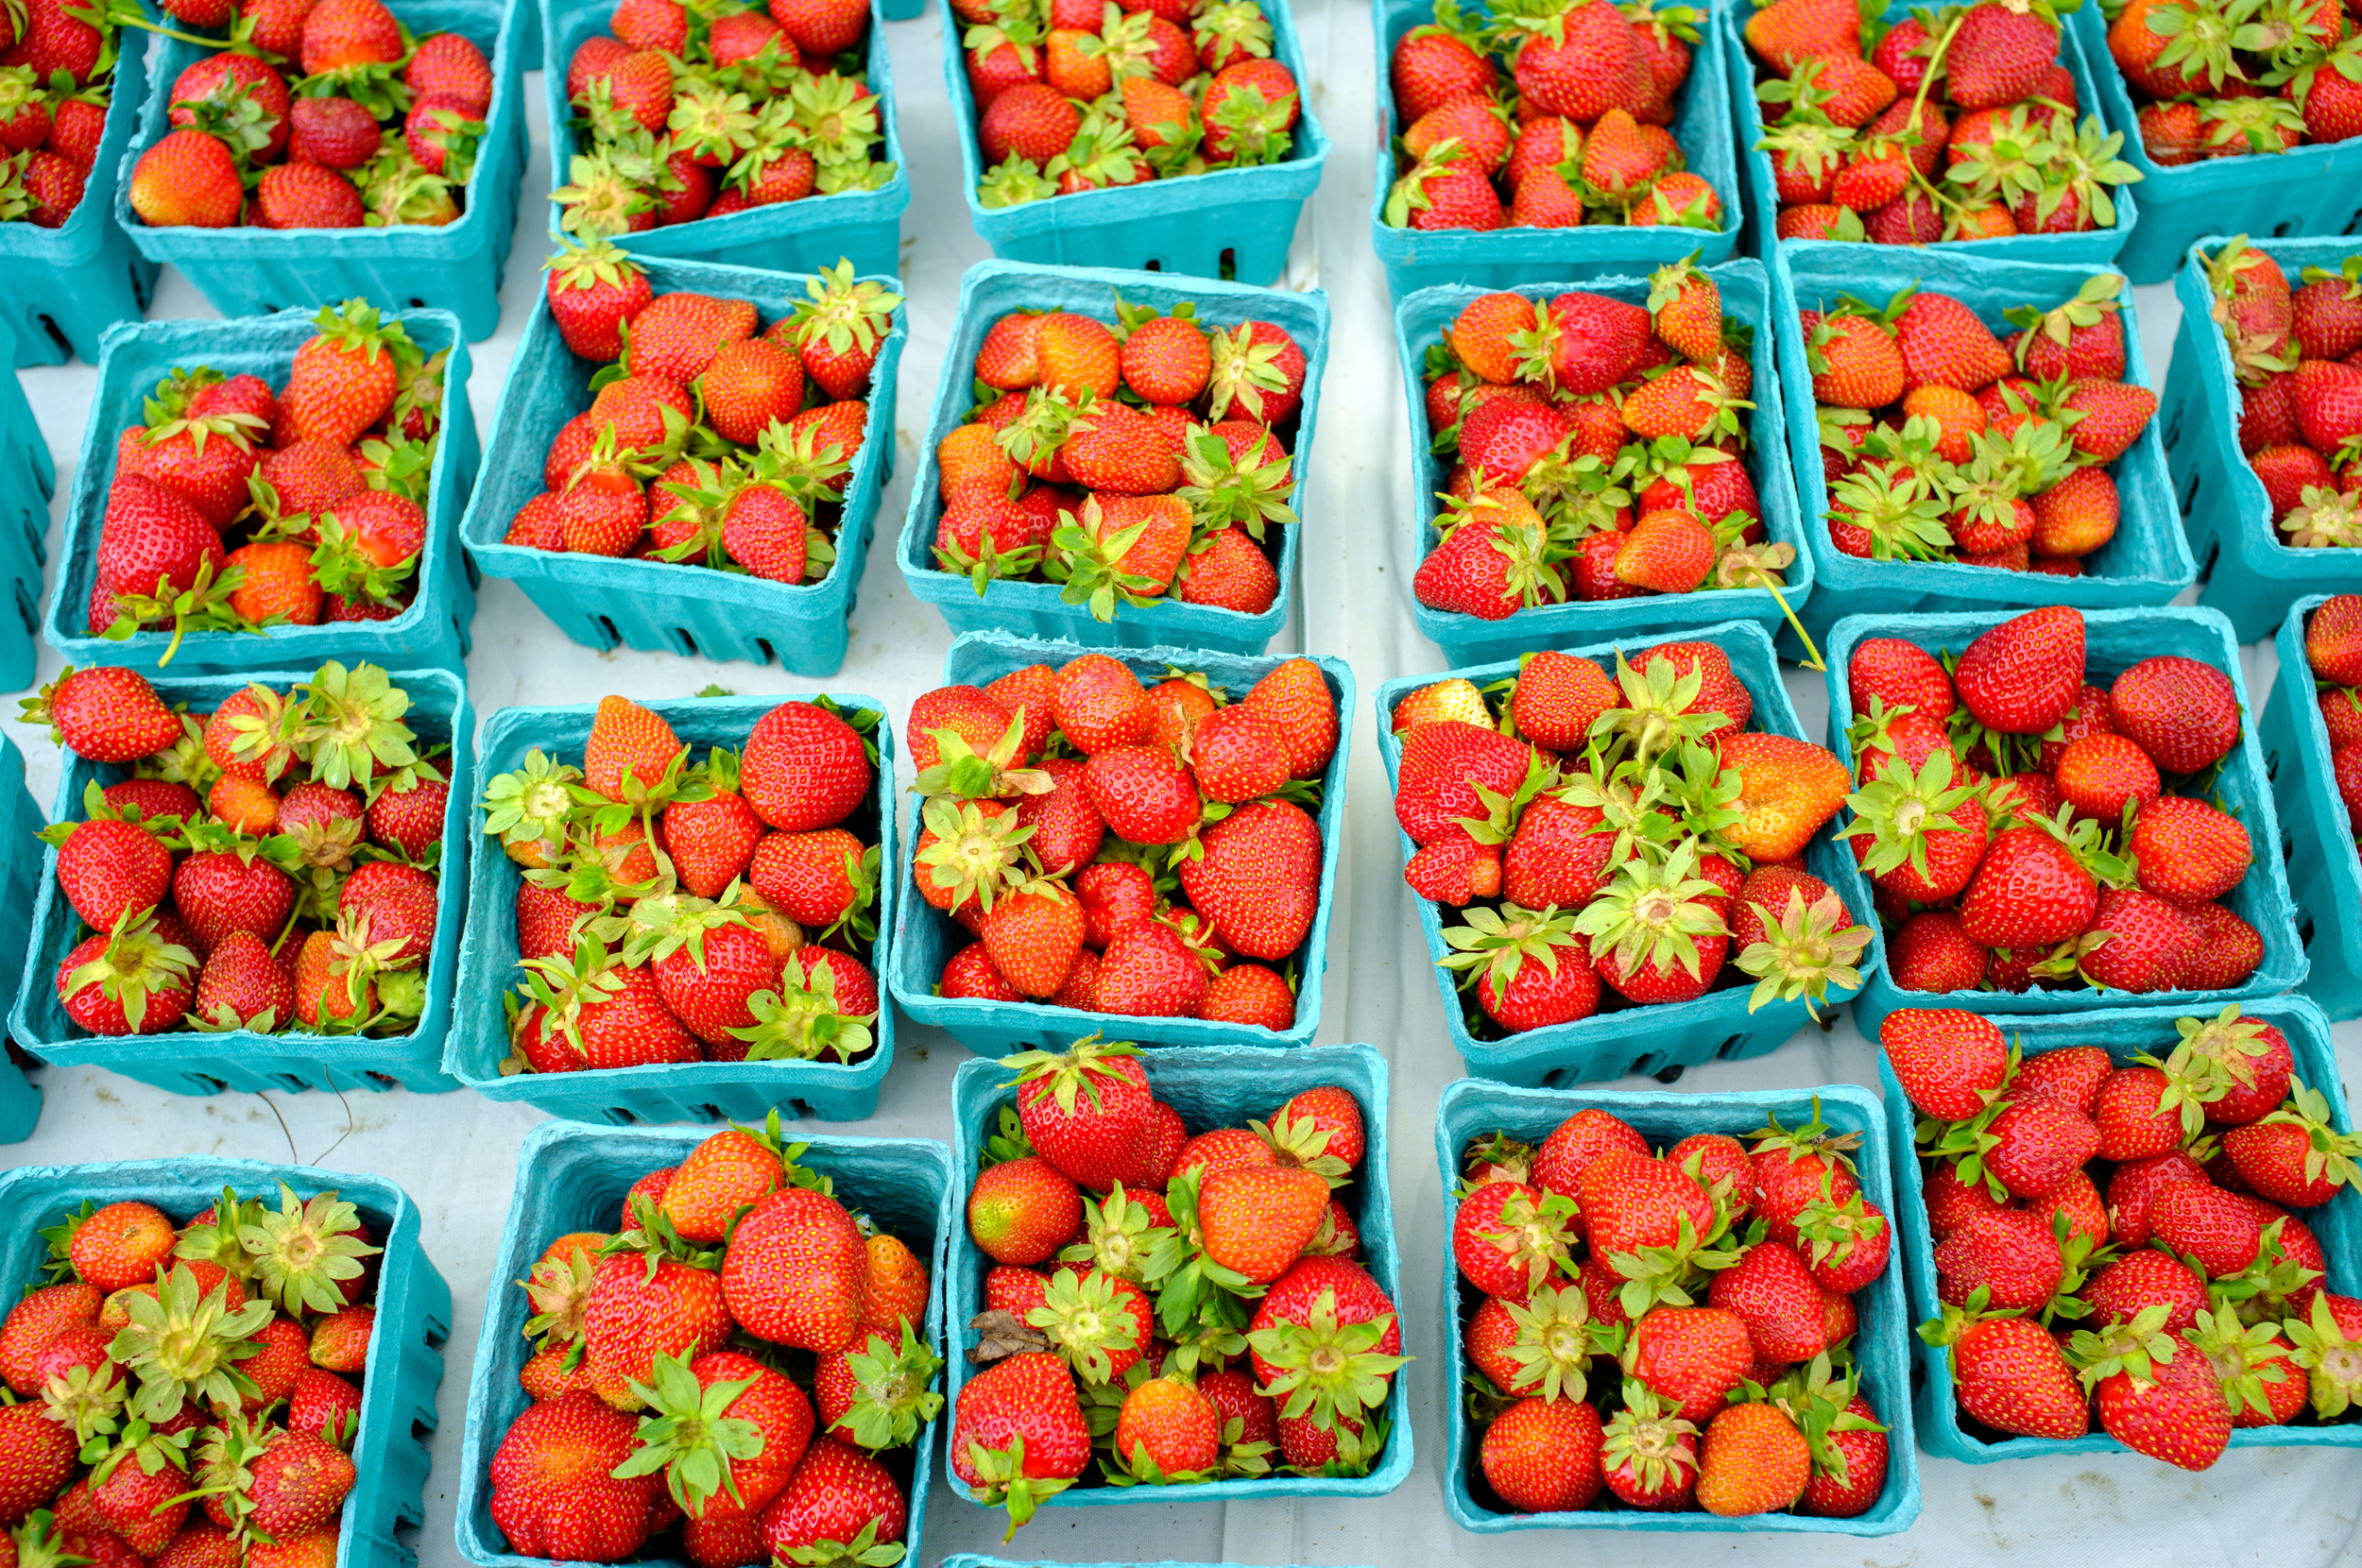 Strawberries at Carroll Gardens Greenmarket